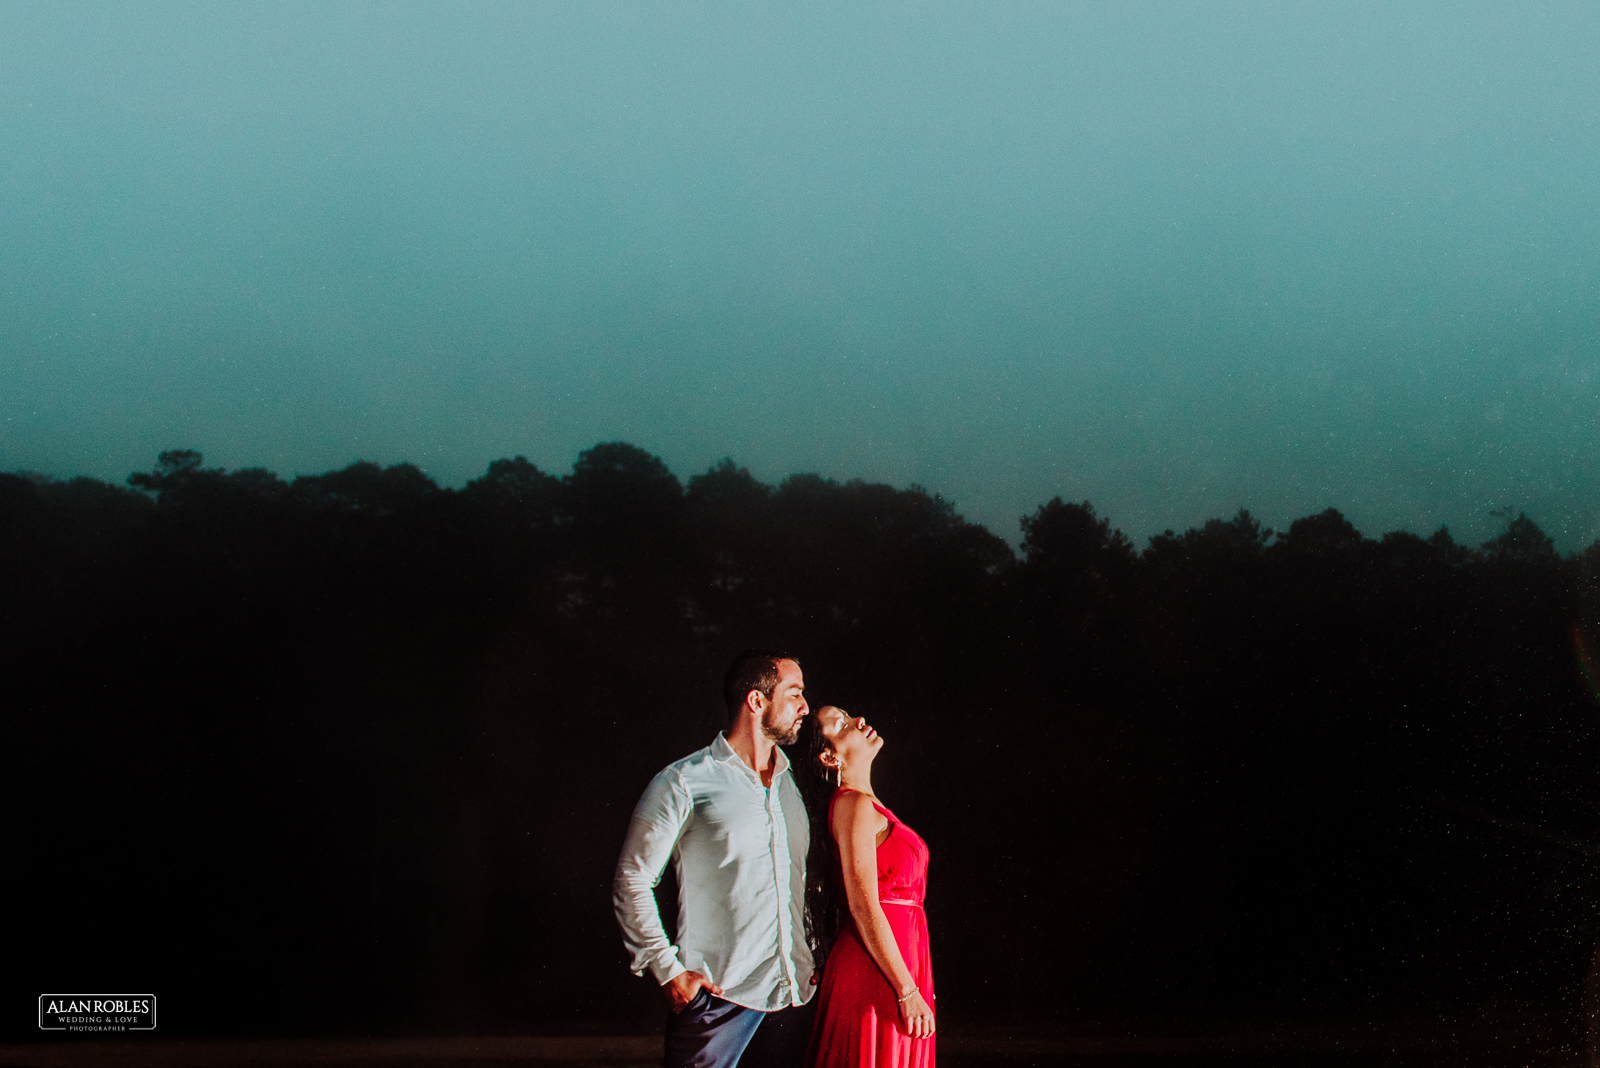 Fotografo de bodas Alan Robles-Pre boda Chiapas-21